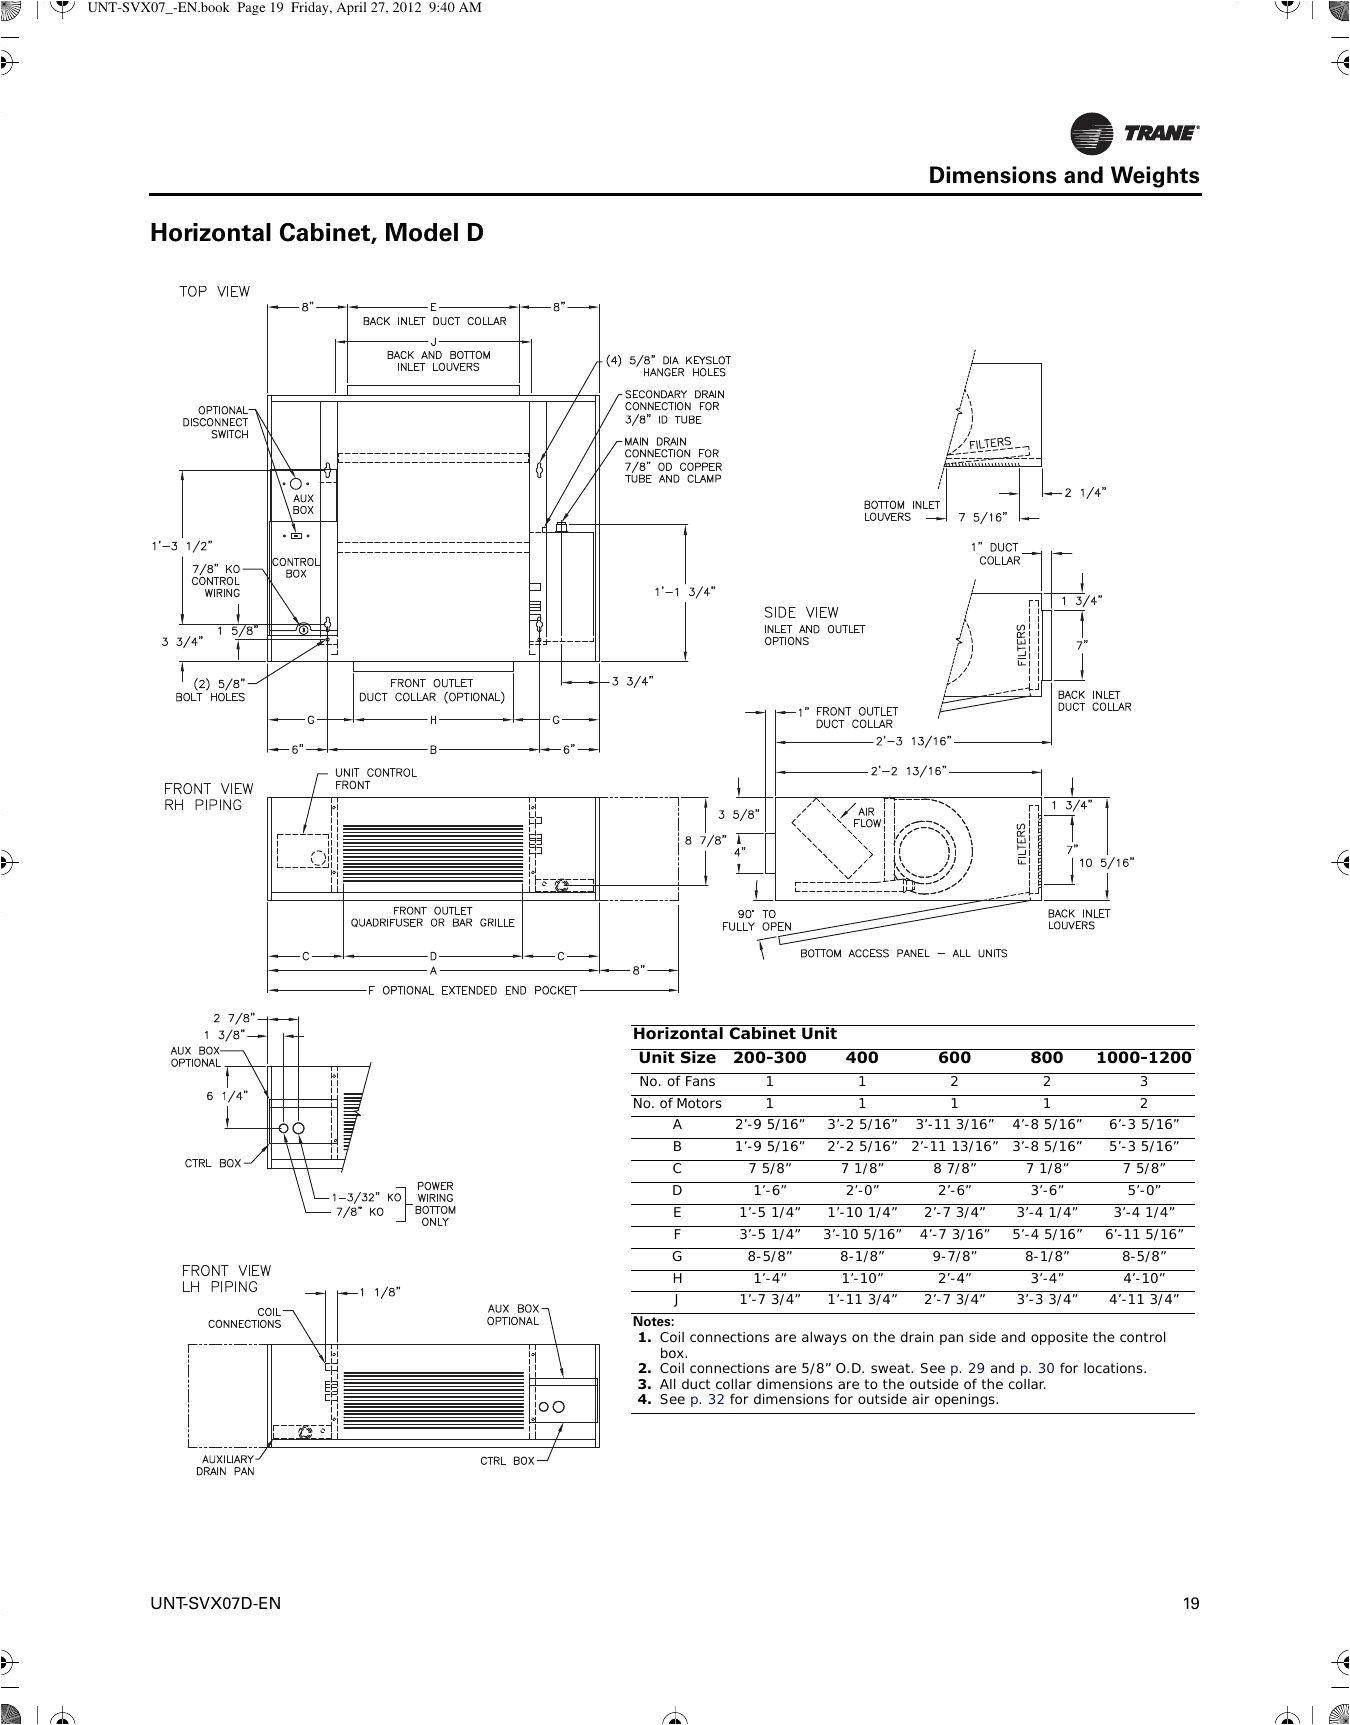 unique wiring diagram for underfloor heating thermostat diagrams digramssample diagramimages wiringdiagramsample wiringdiagram